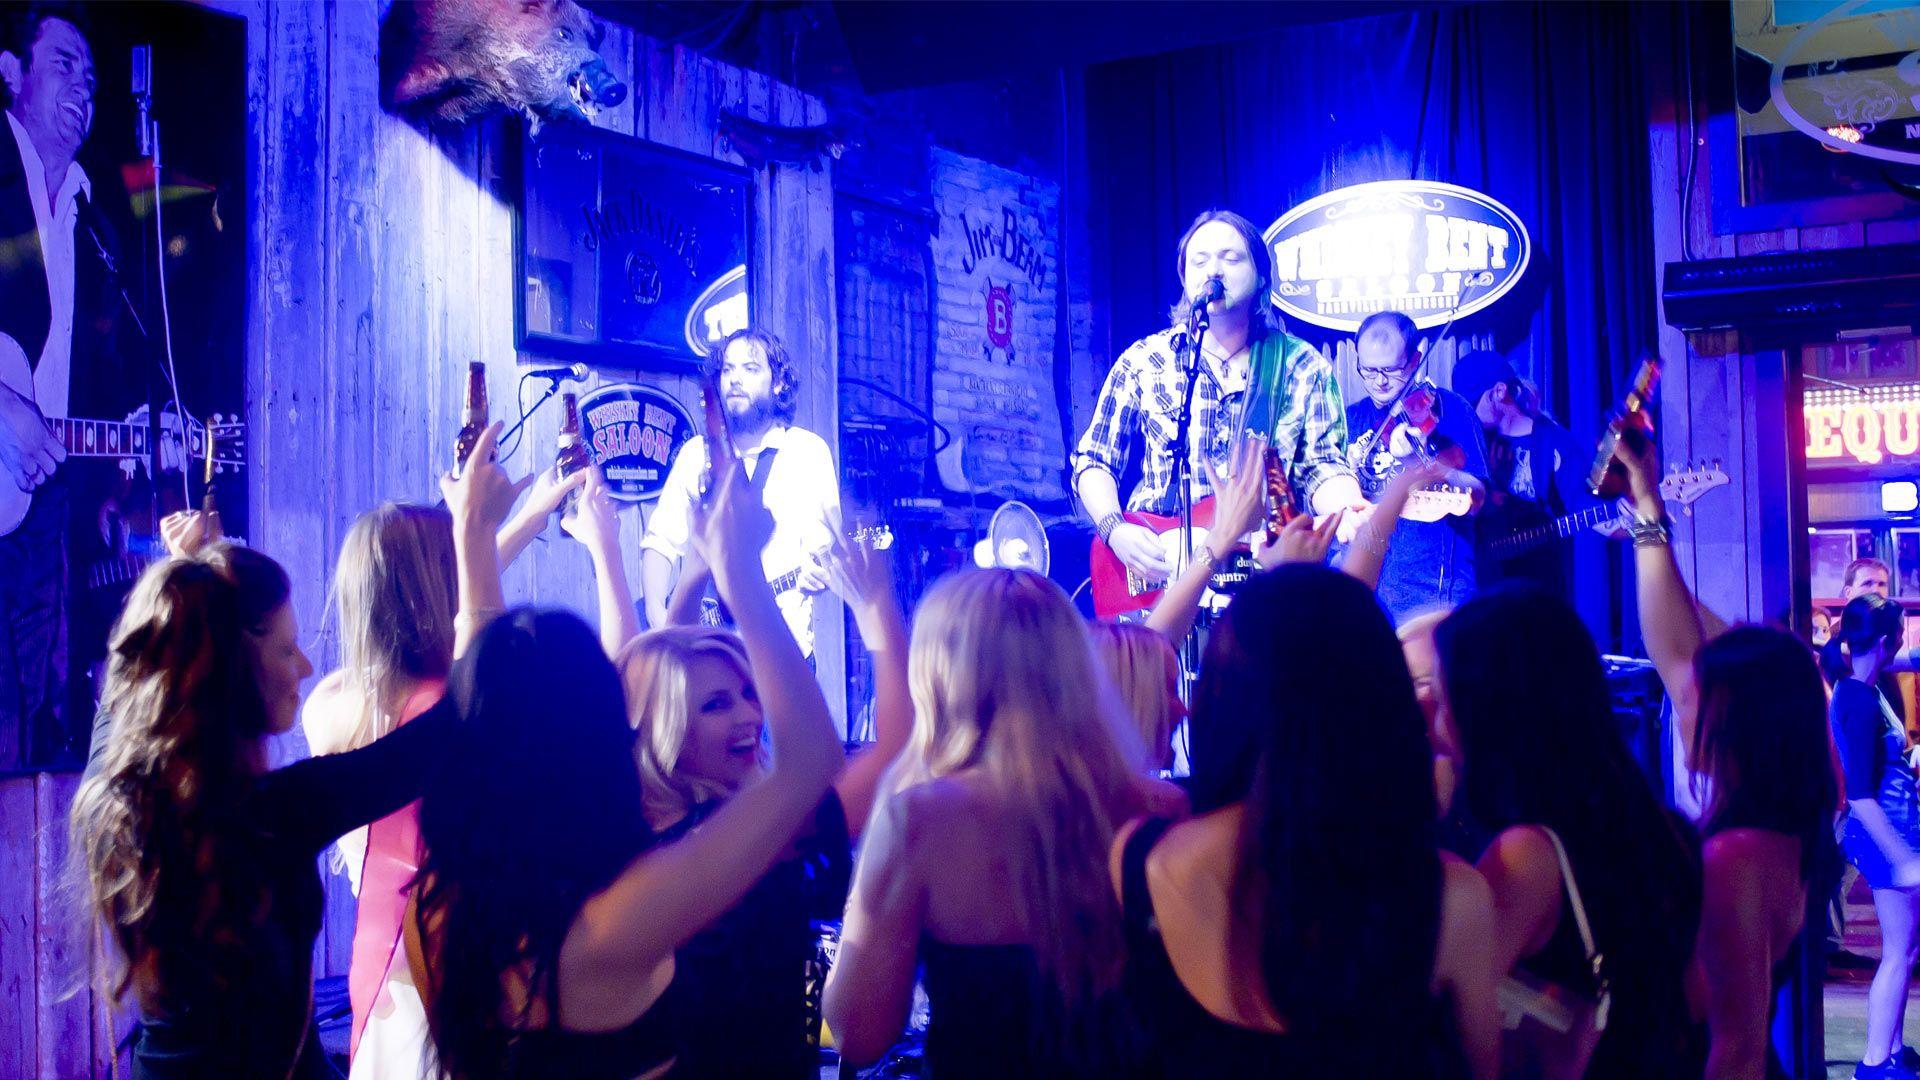 Bachelorette Nashville - Bachelorette Parties in Nashville! Party Bus and Limos available